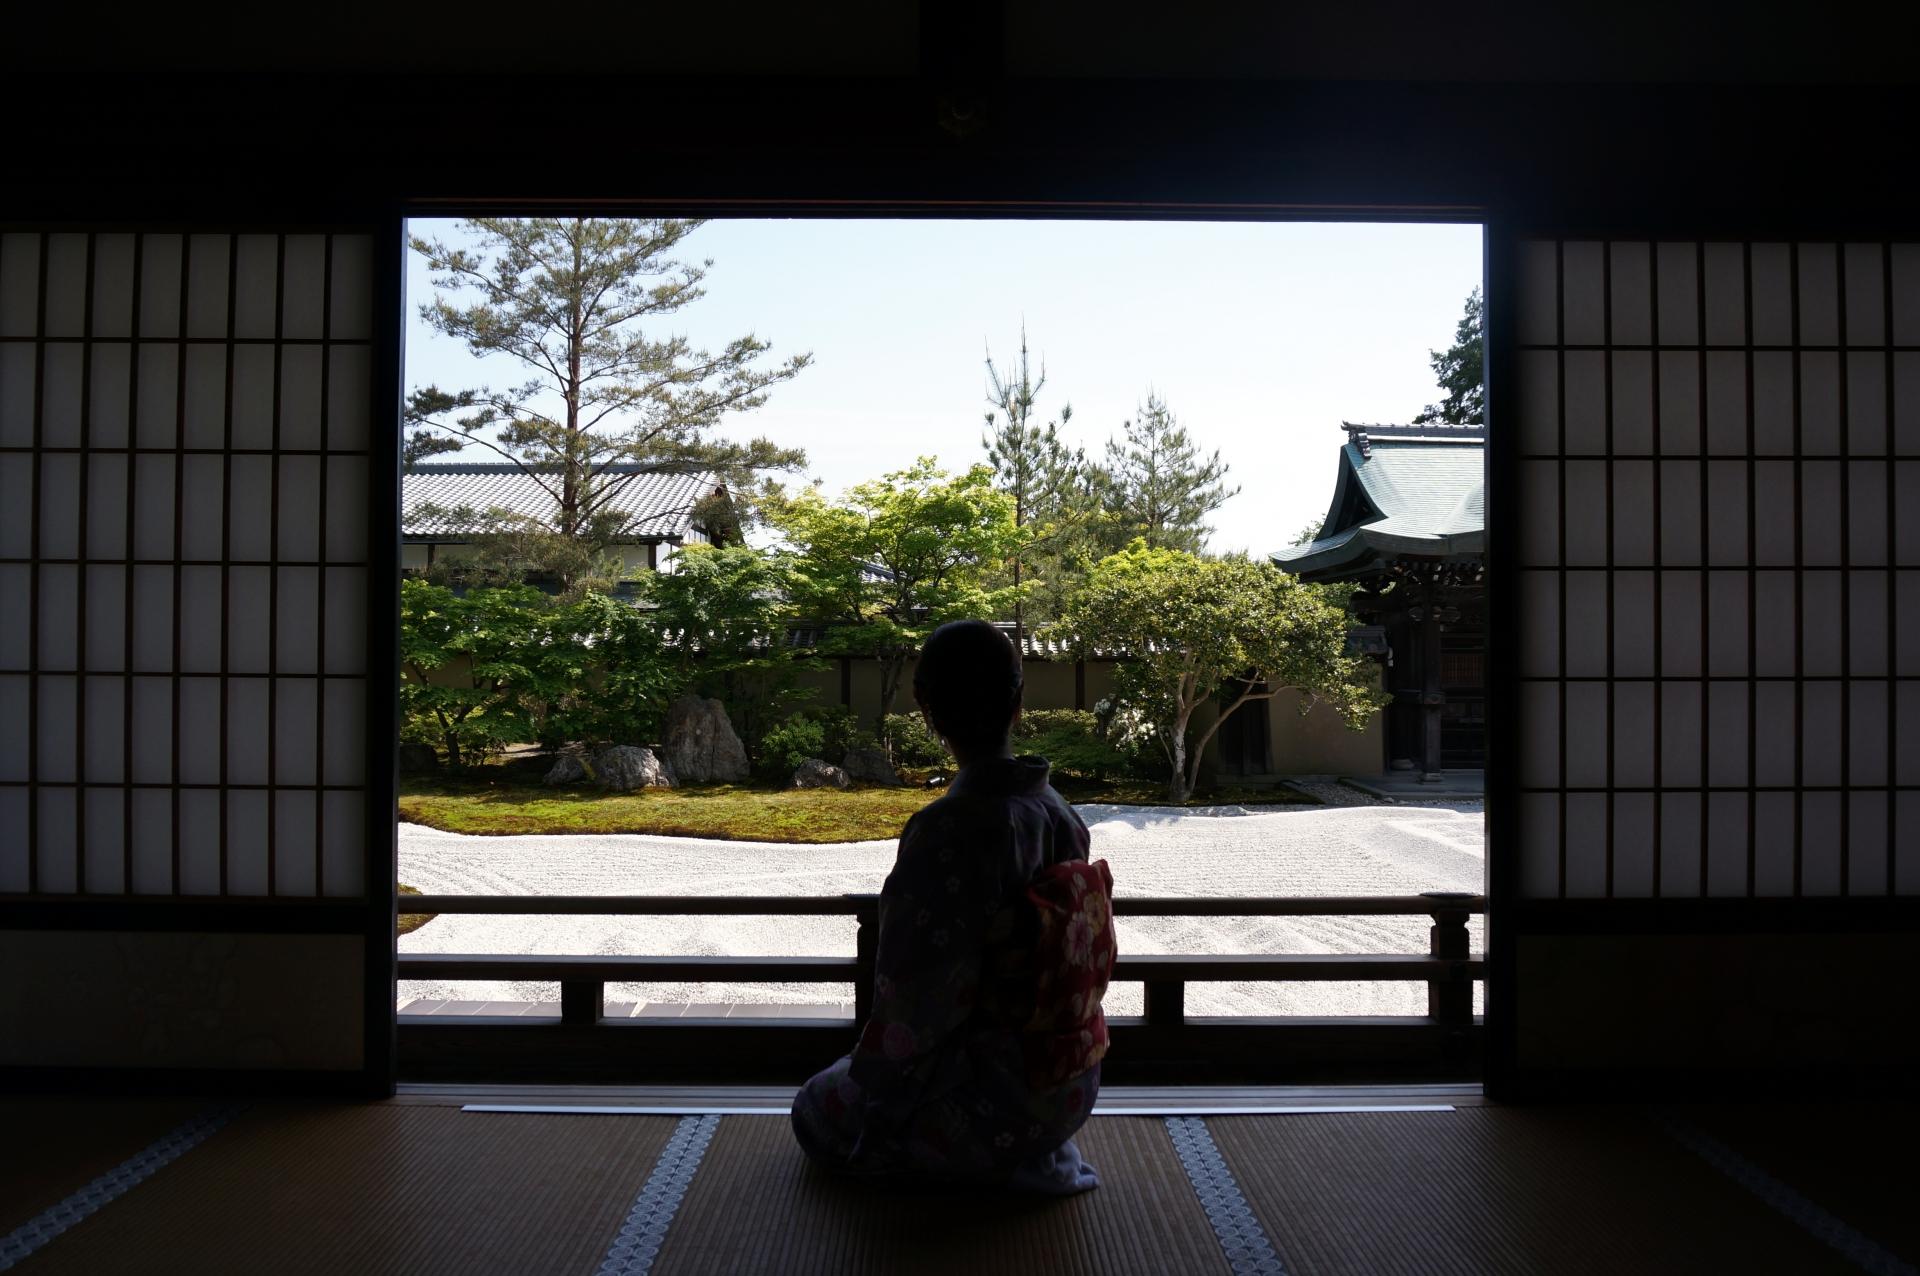 mihaku,社長ブログ,茶道,おもてなし